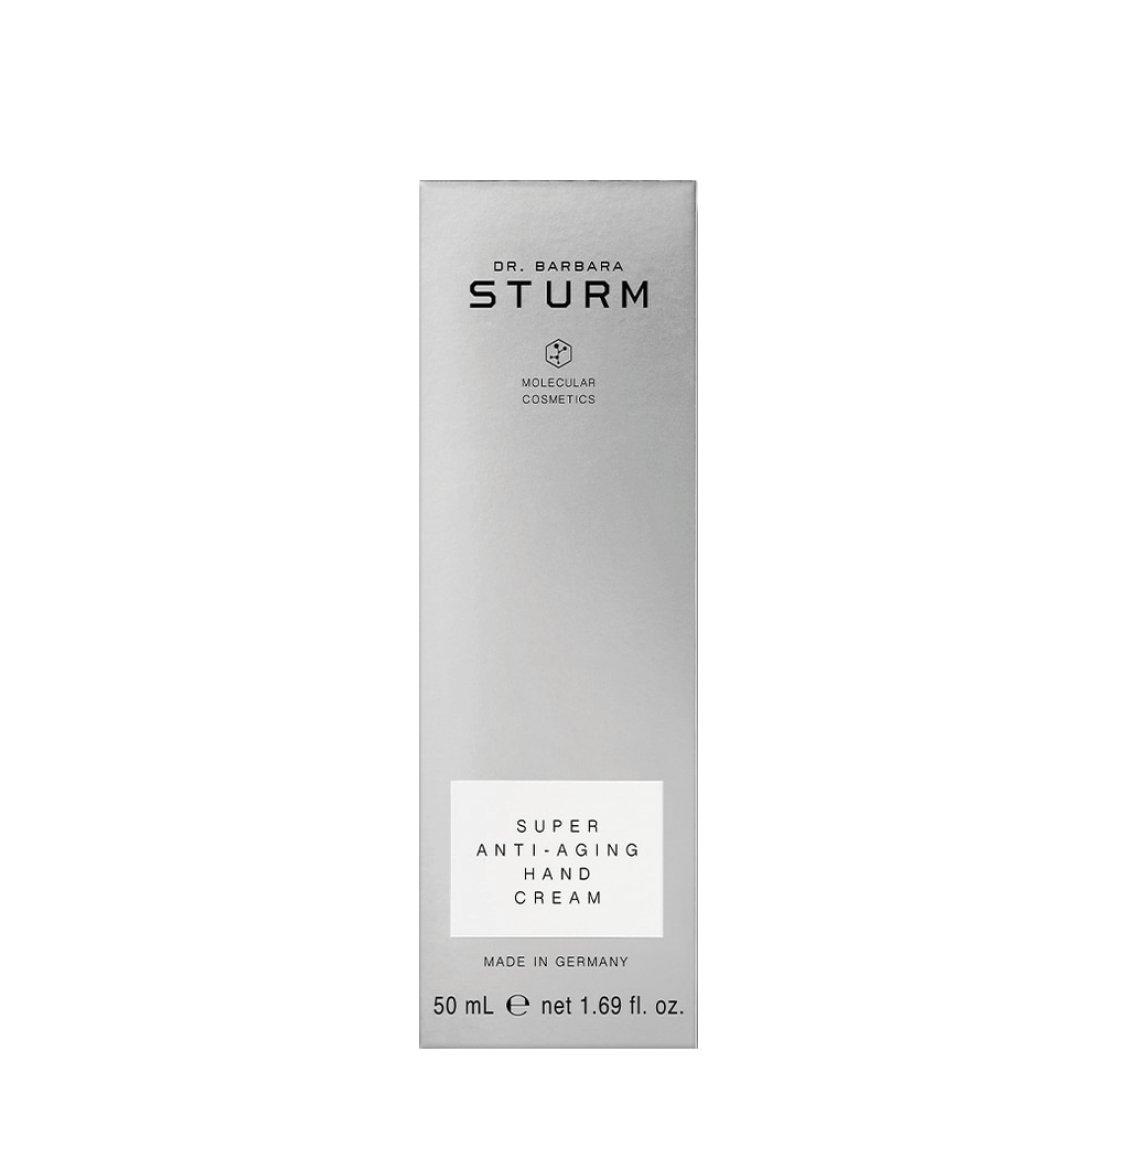 Dr. Barbara Sturm Super Anti-Aging Hand Cream 50ml